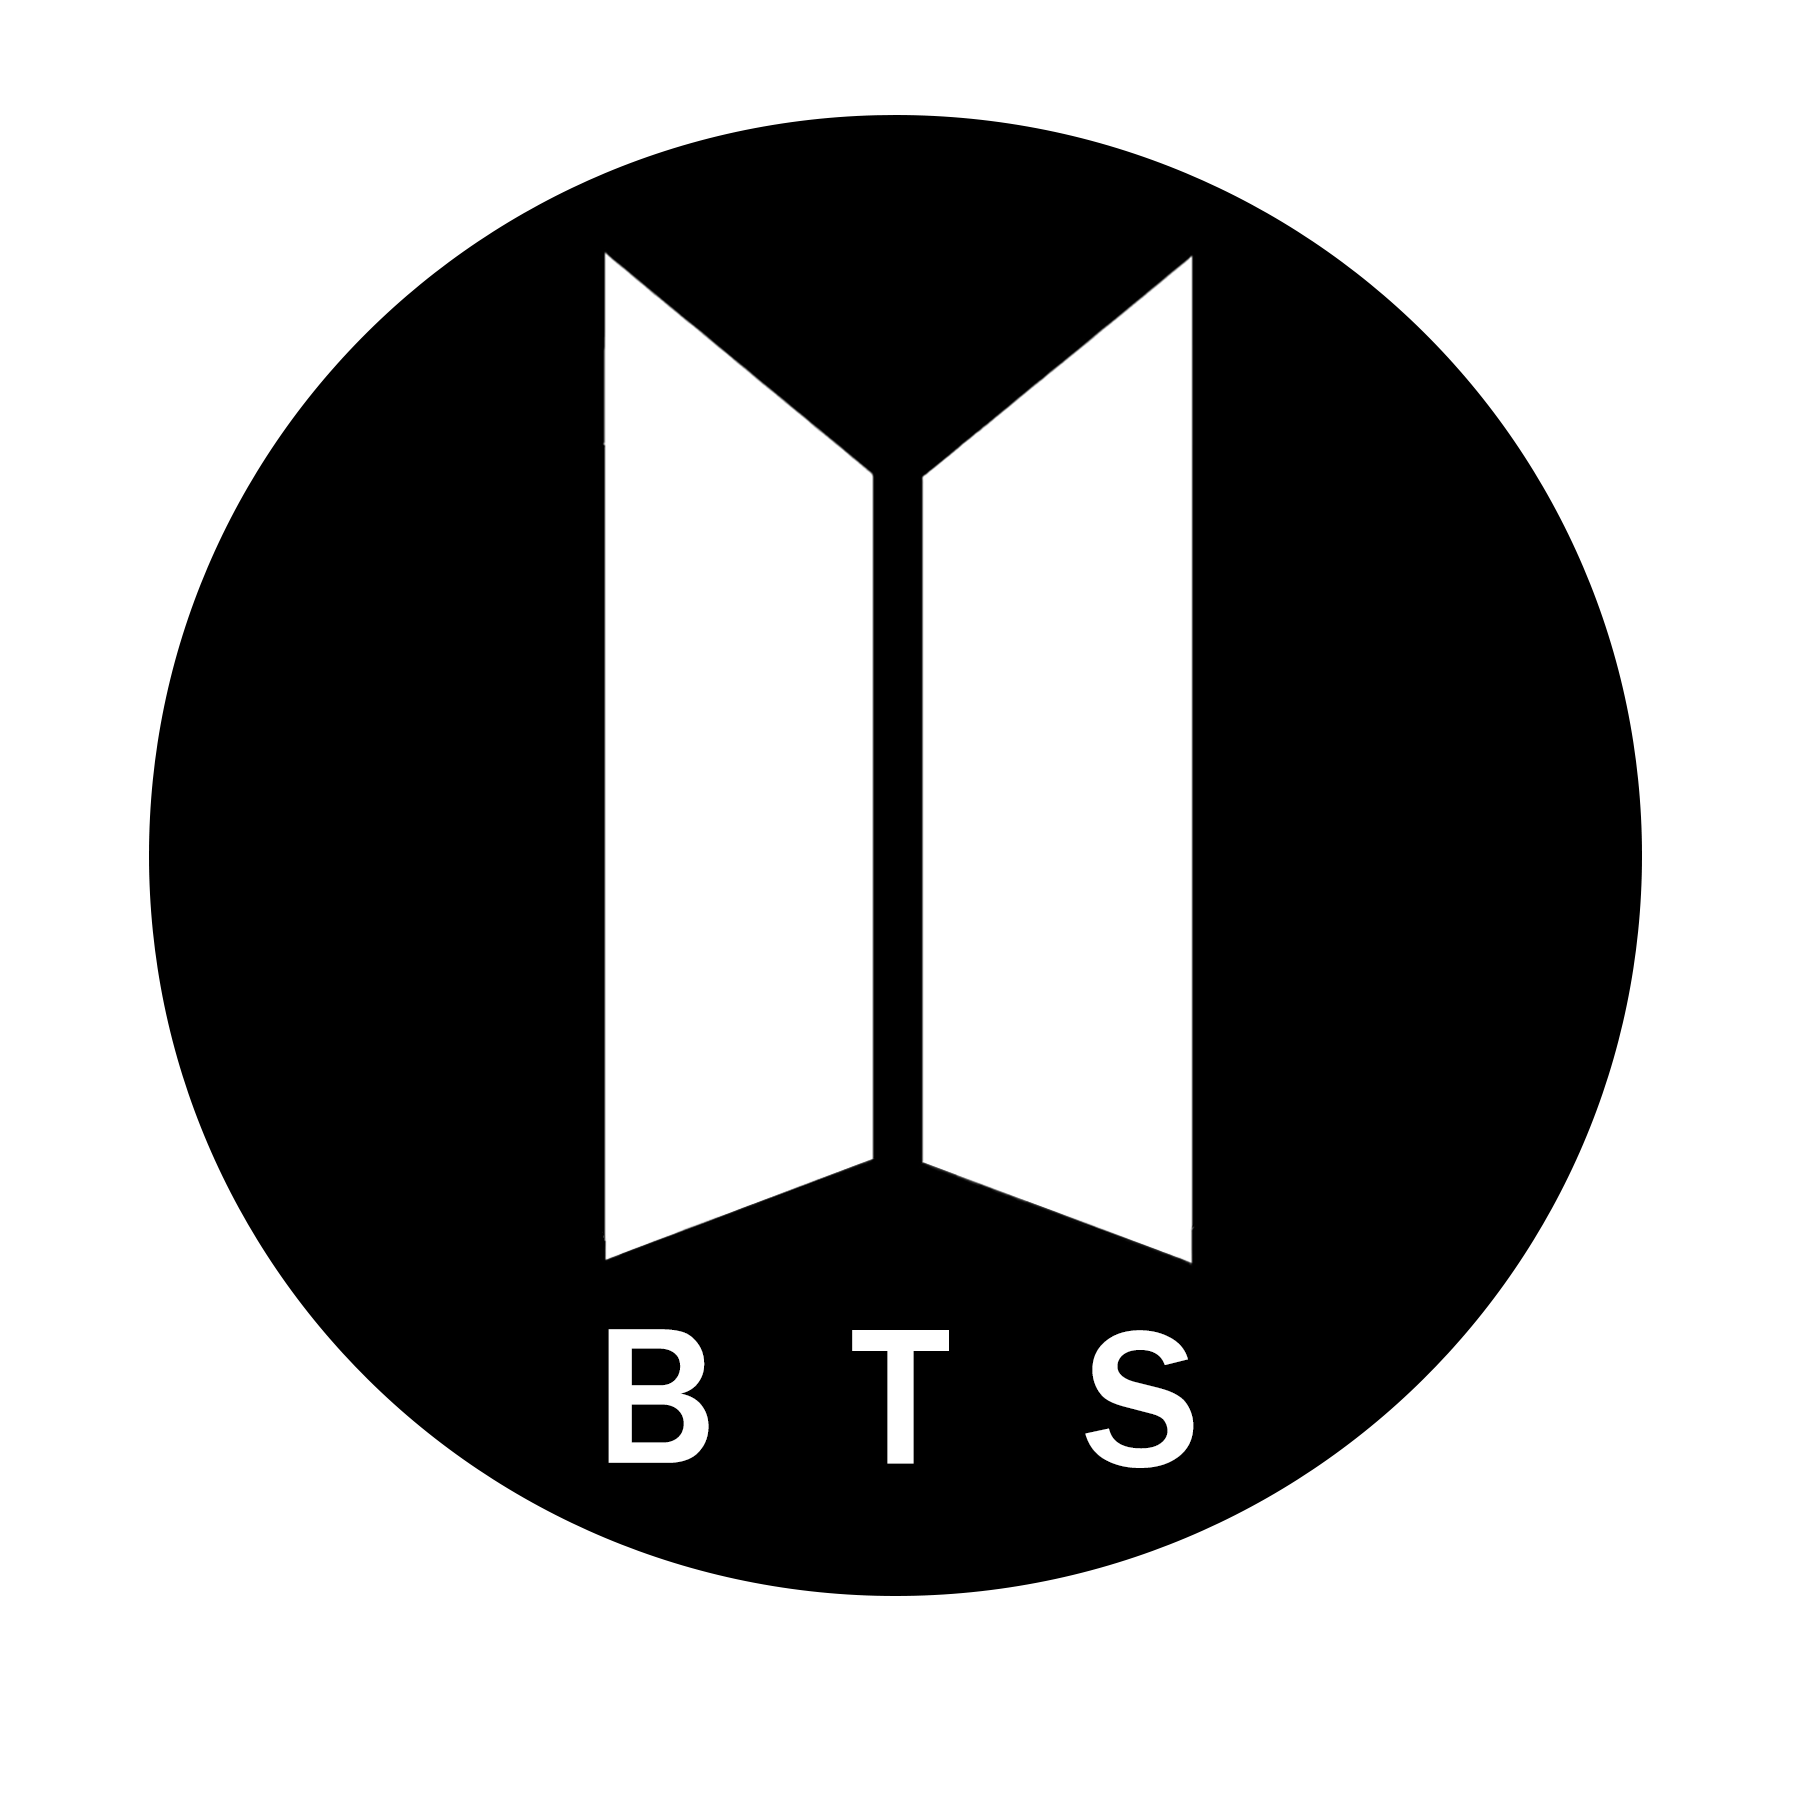 Explore More Awesome BTS Logos.